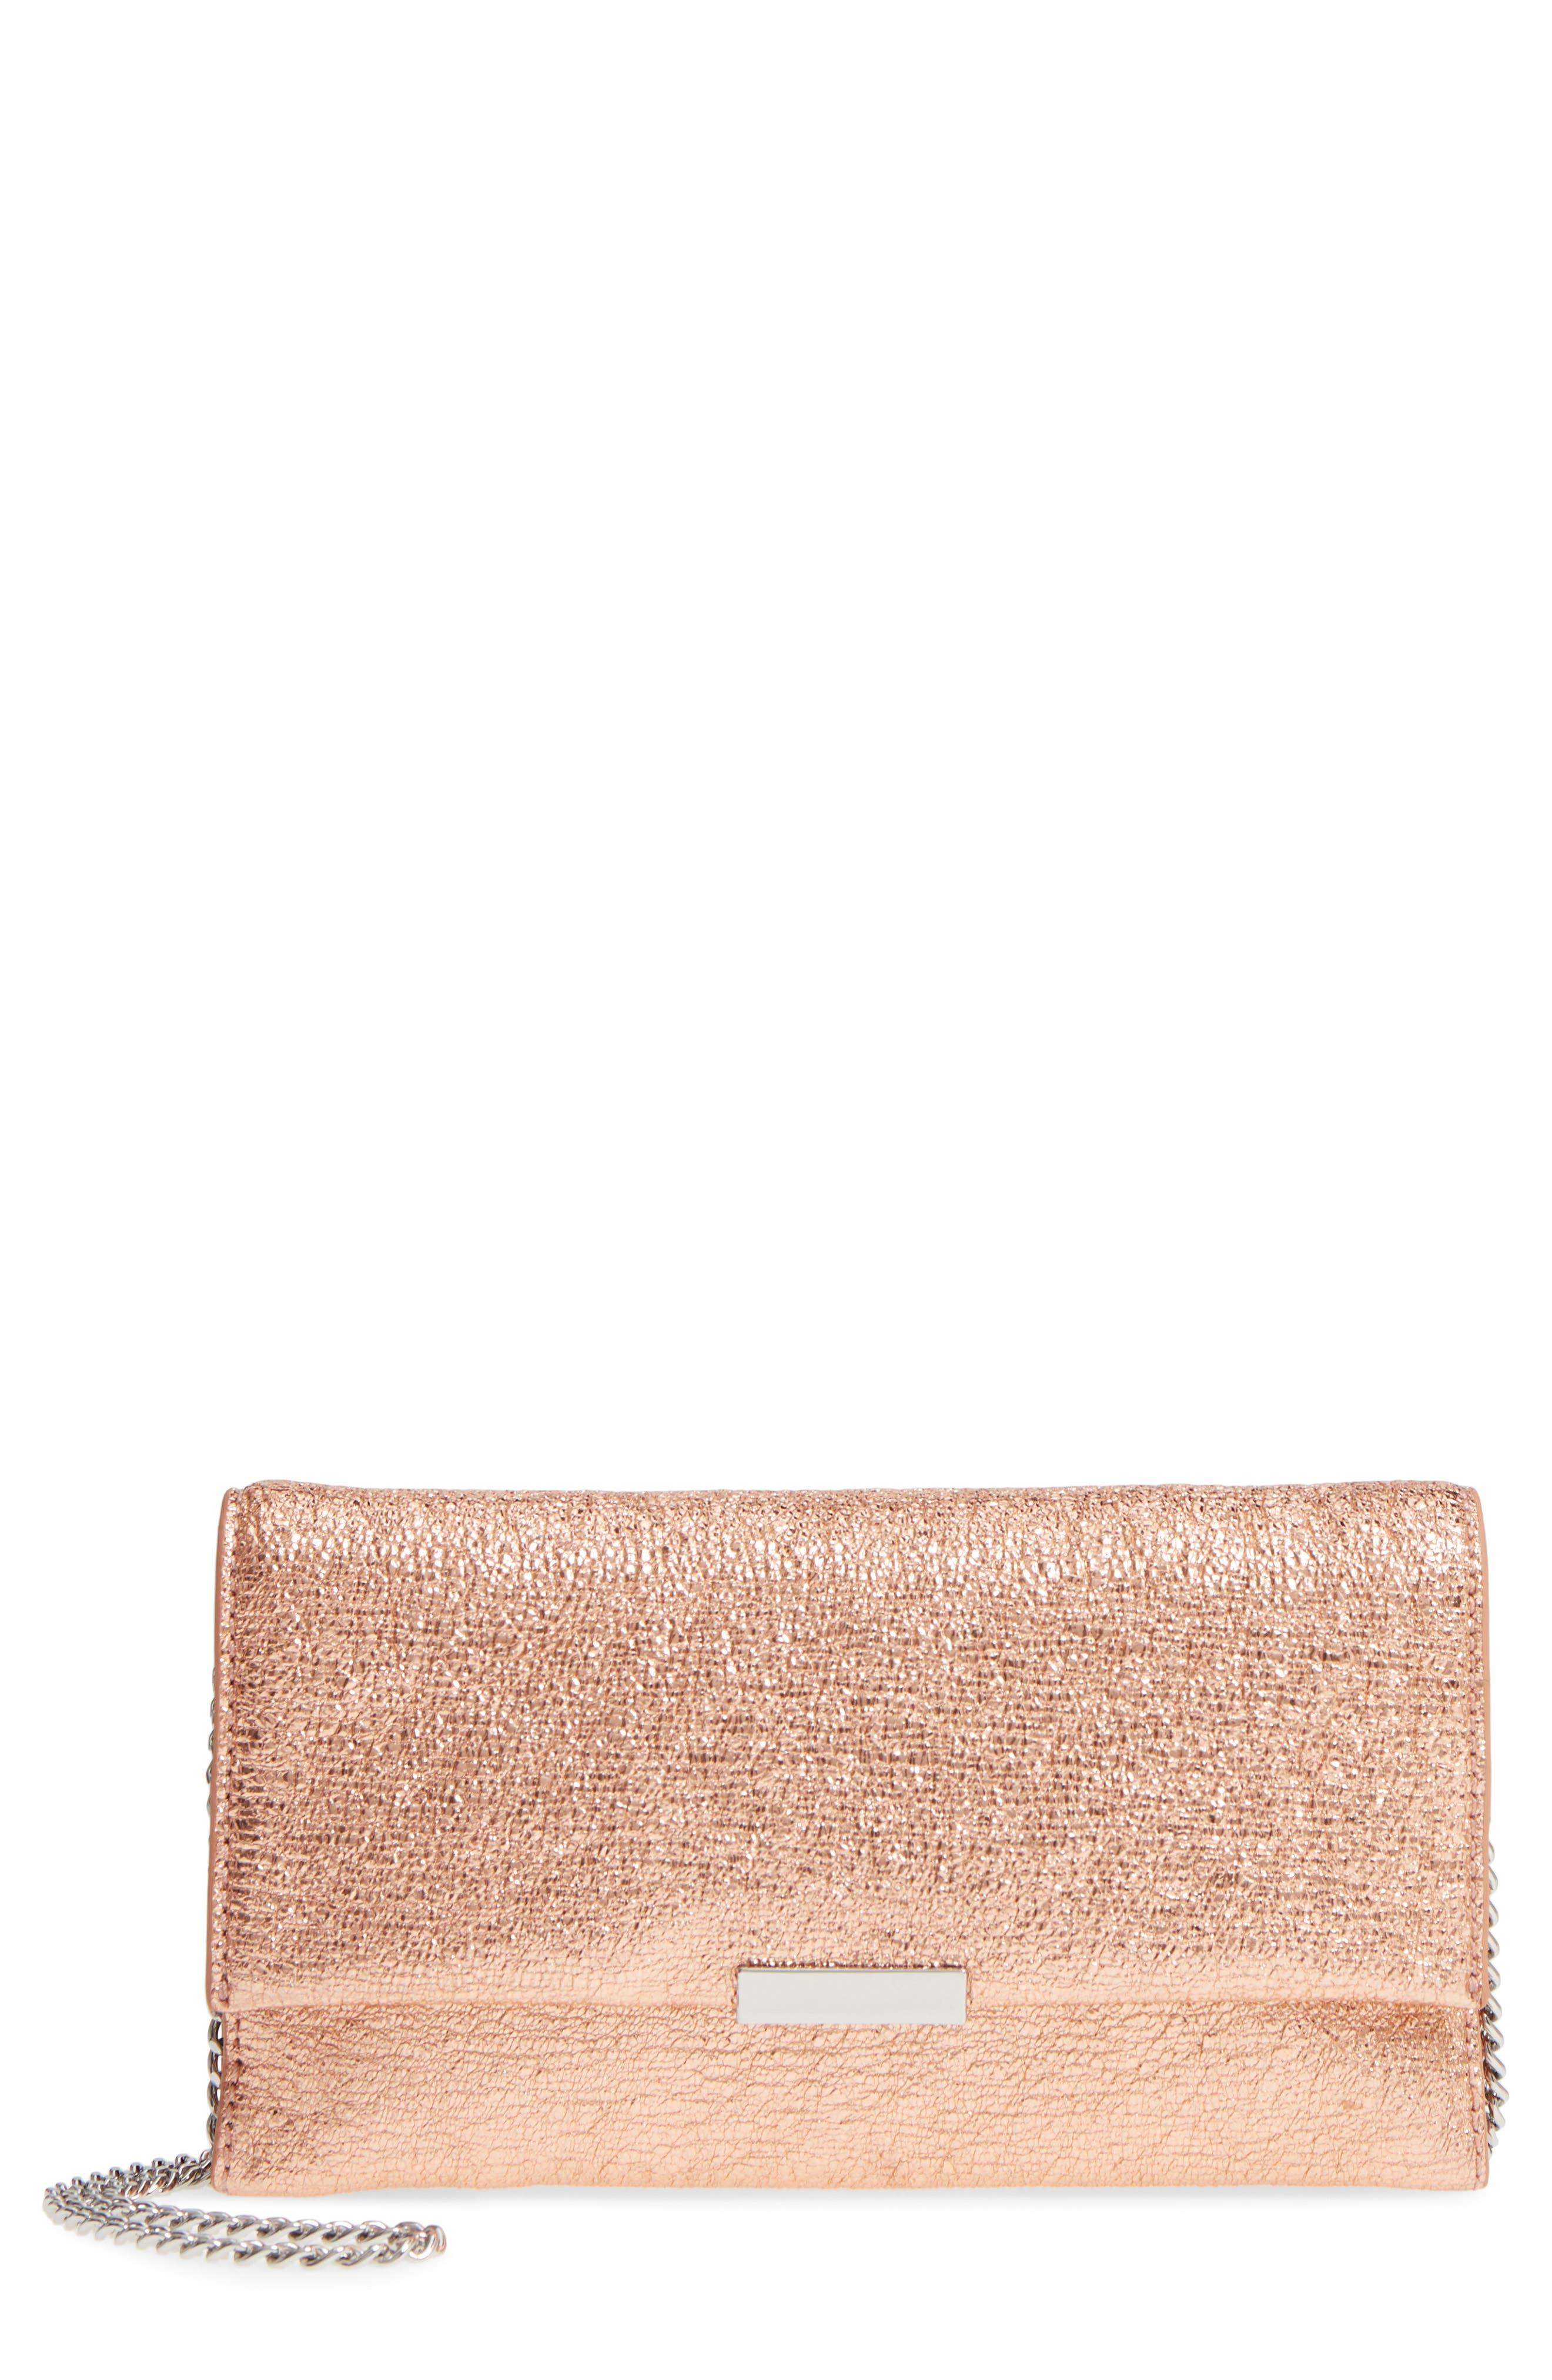 Loeffler Randall Metallic Leather Tab Clutch